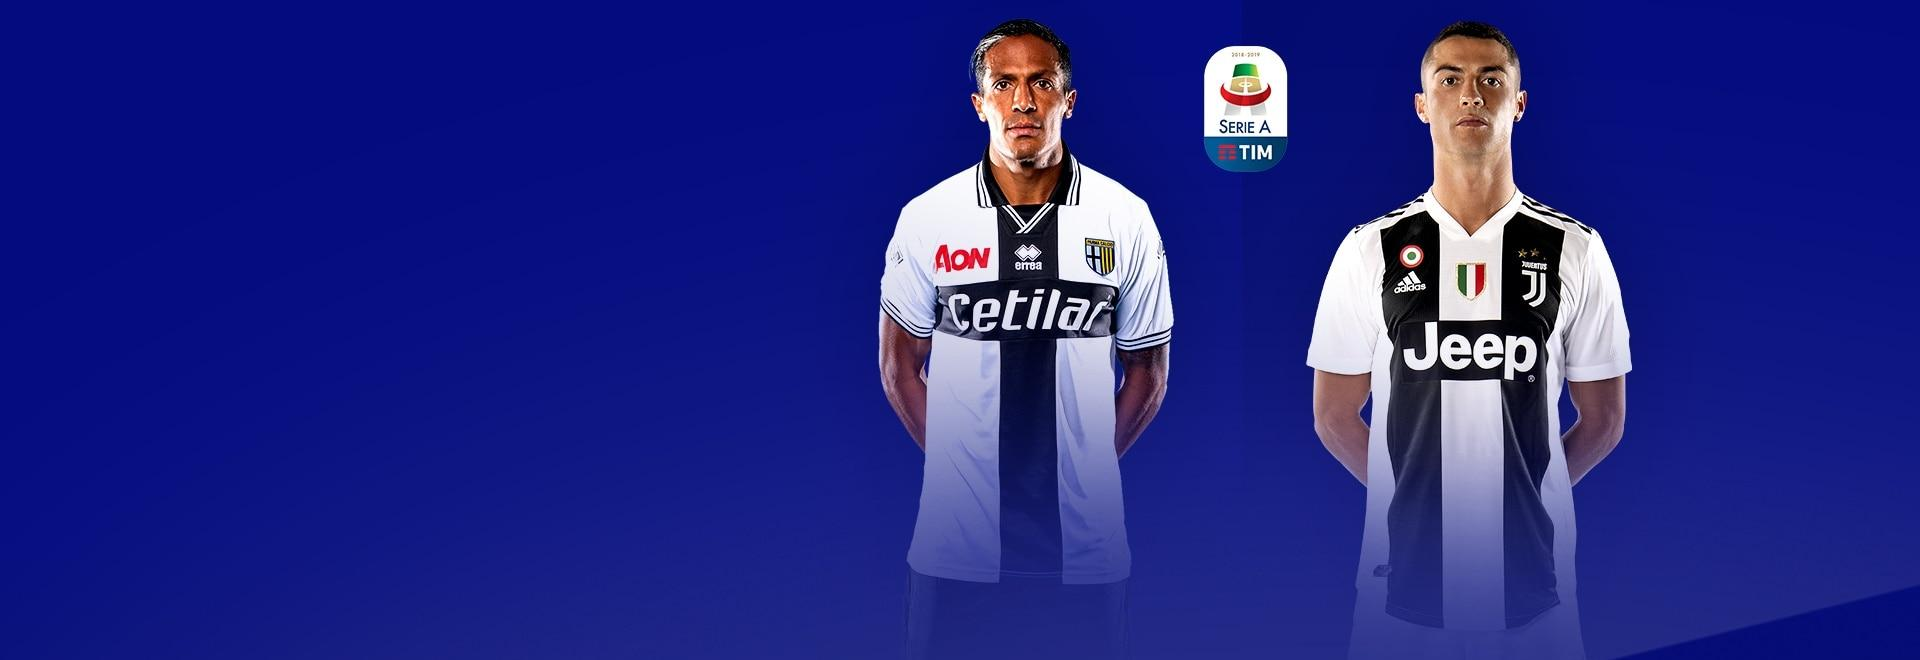 Parma - Juventus. 3a g.